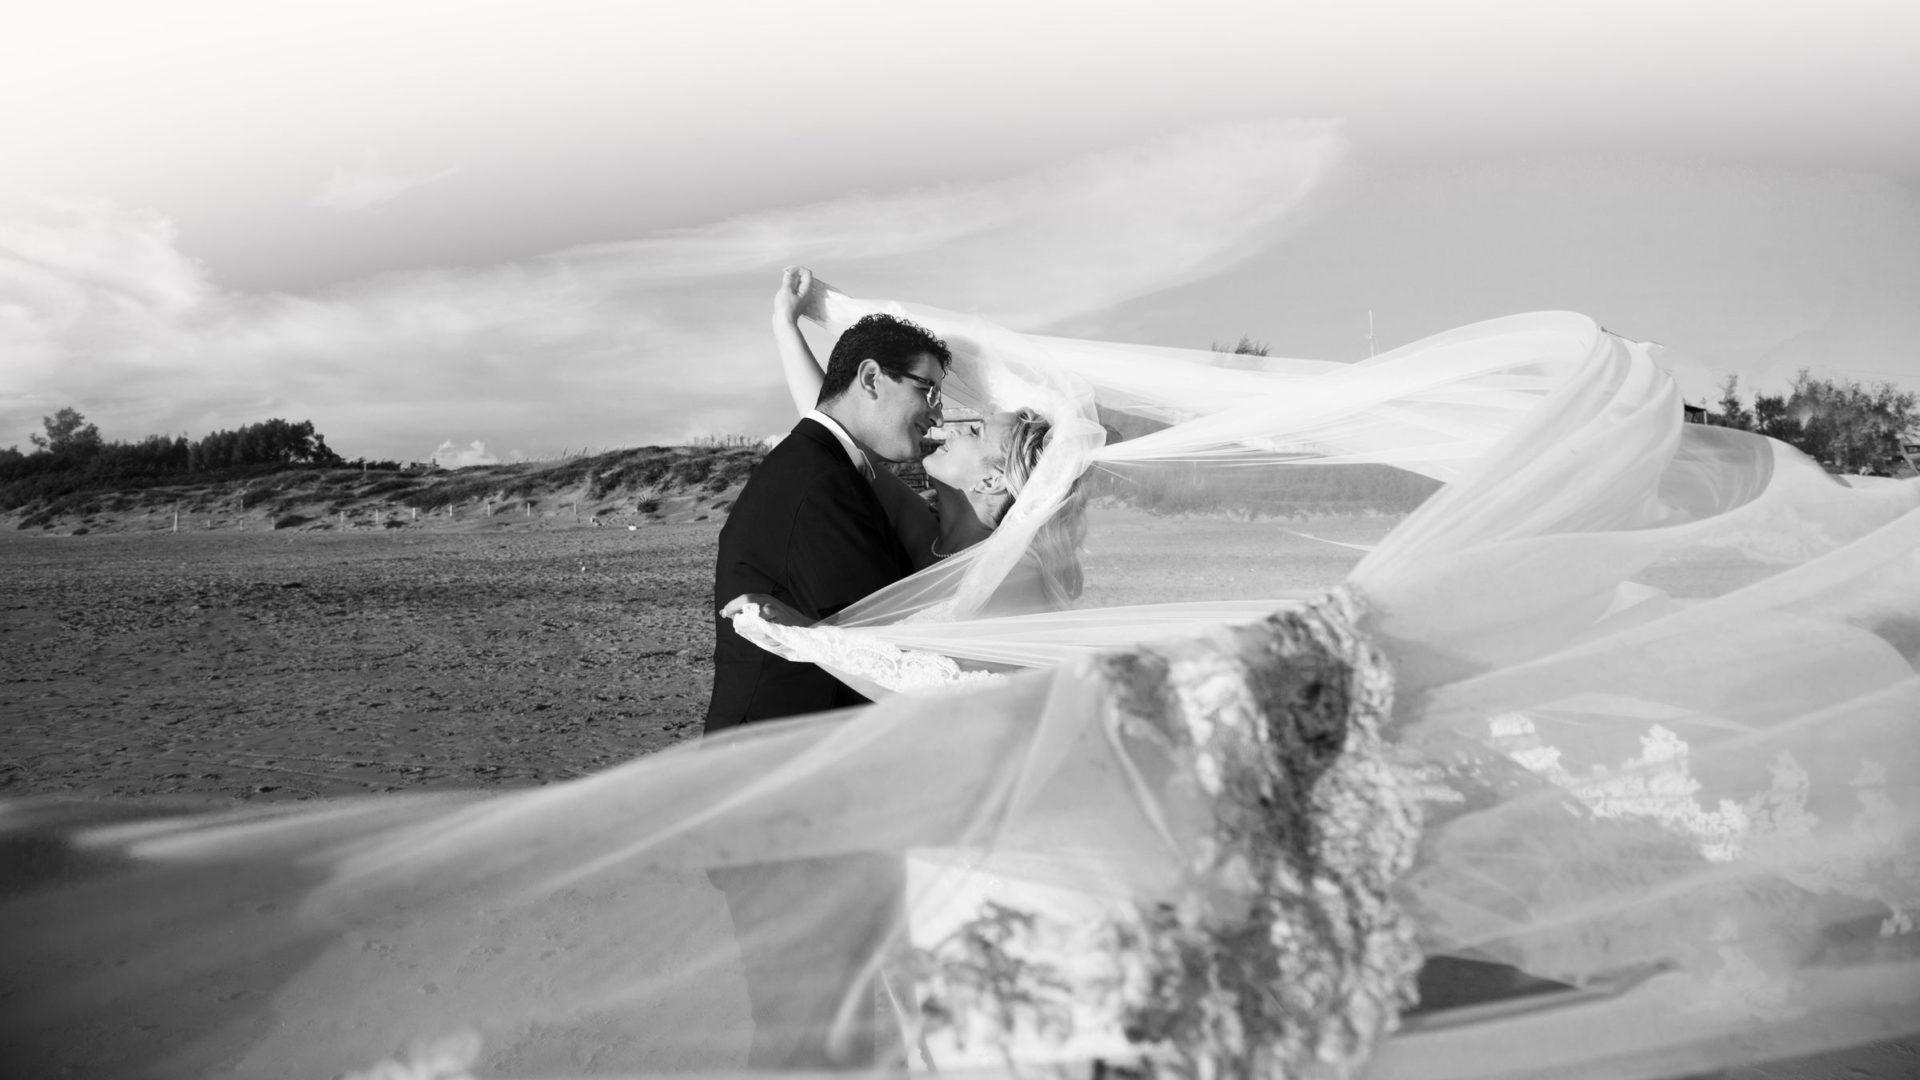 Aysthesis Foto Studio Emanuele Caruso Fotografo